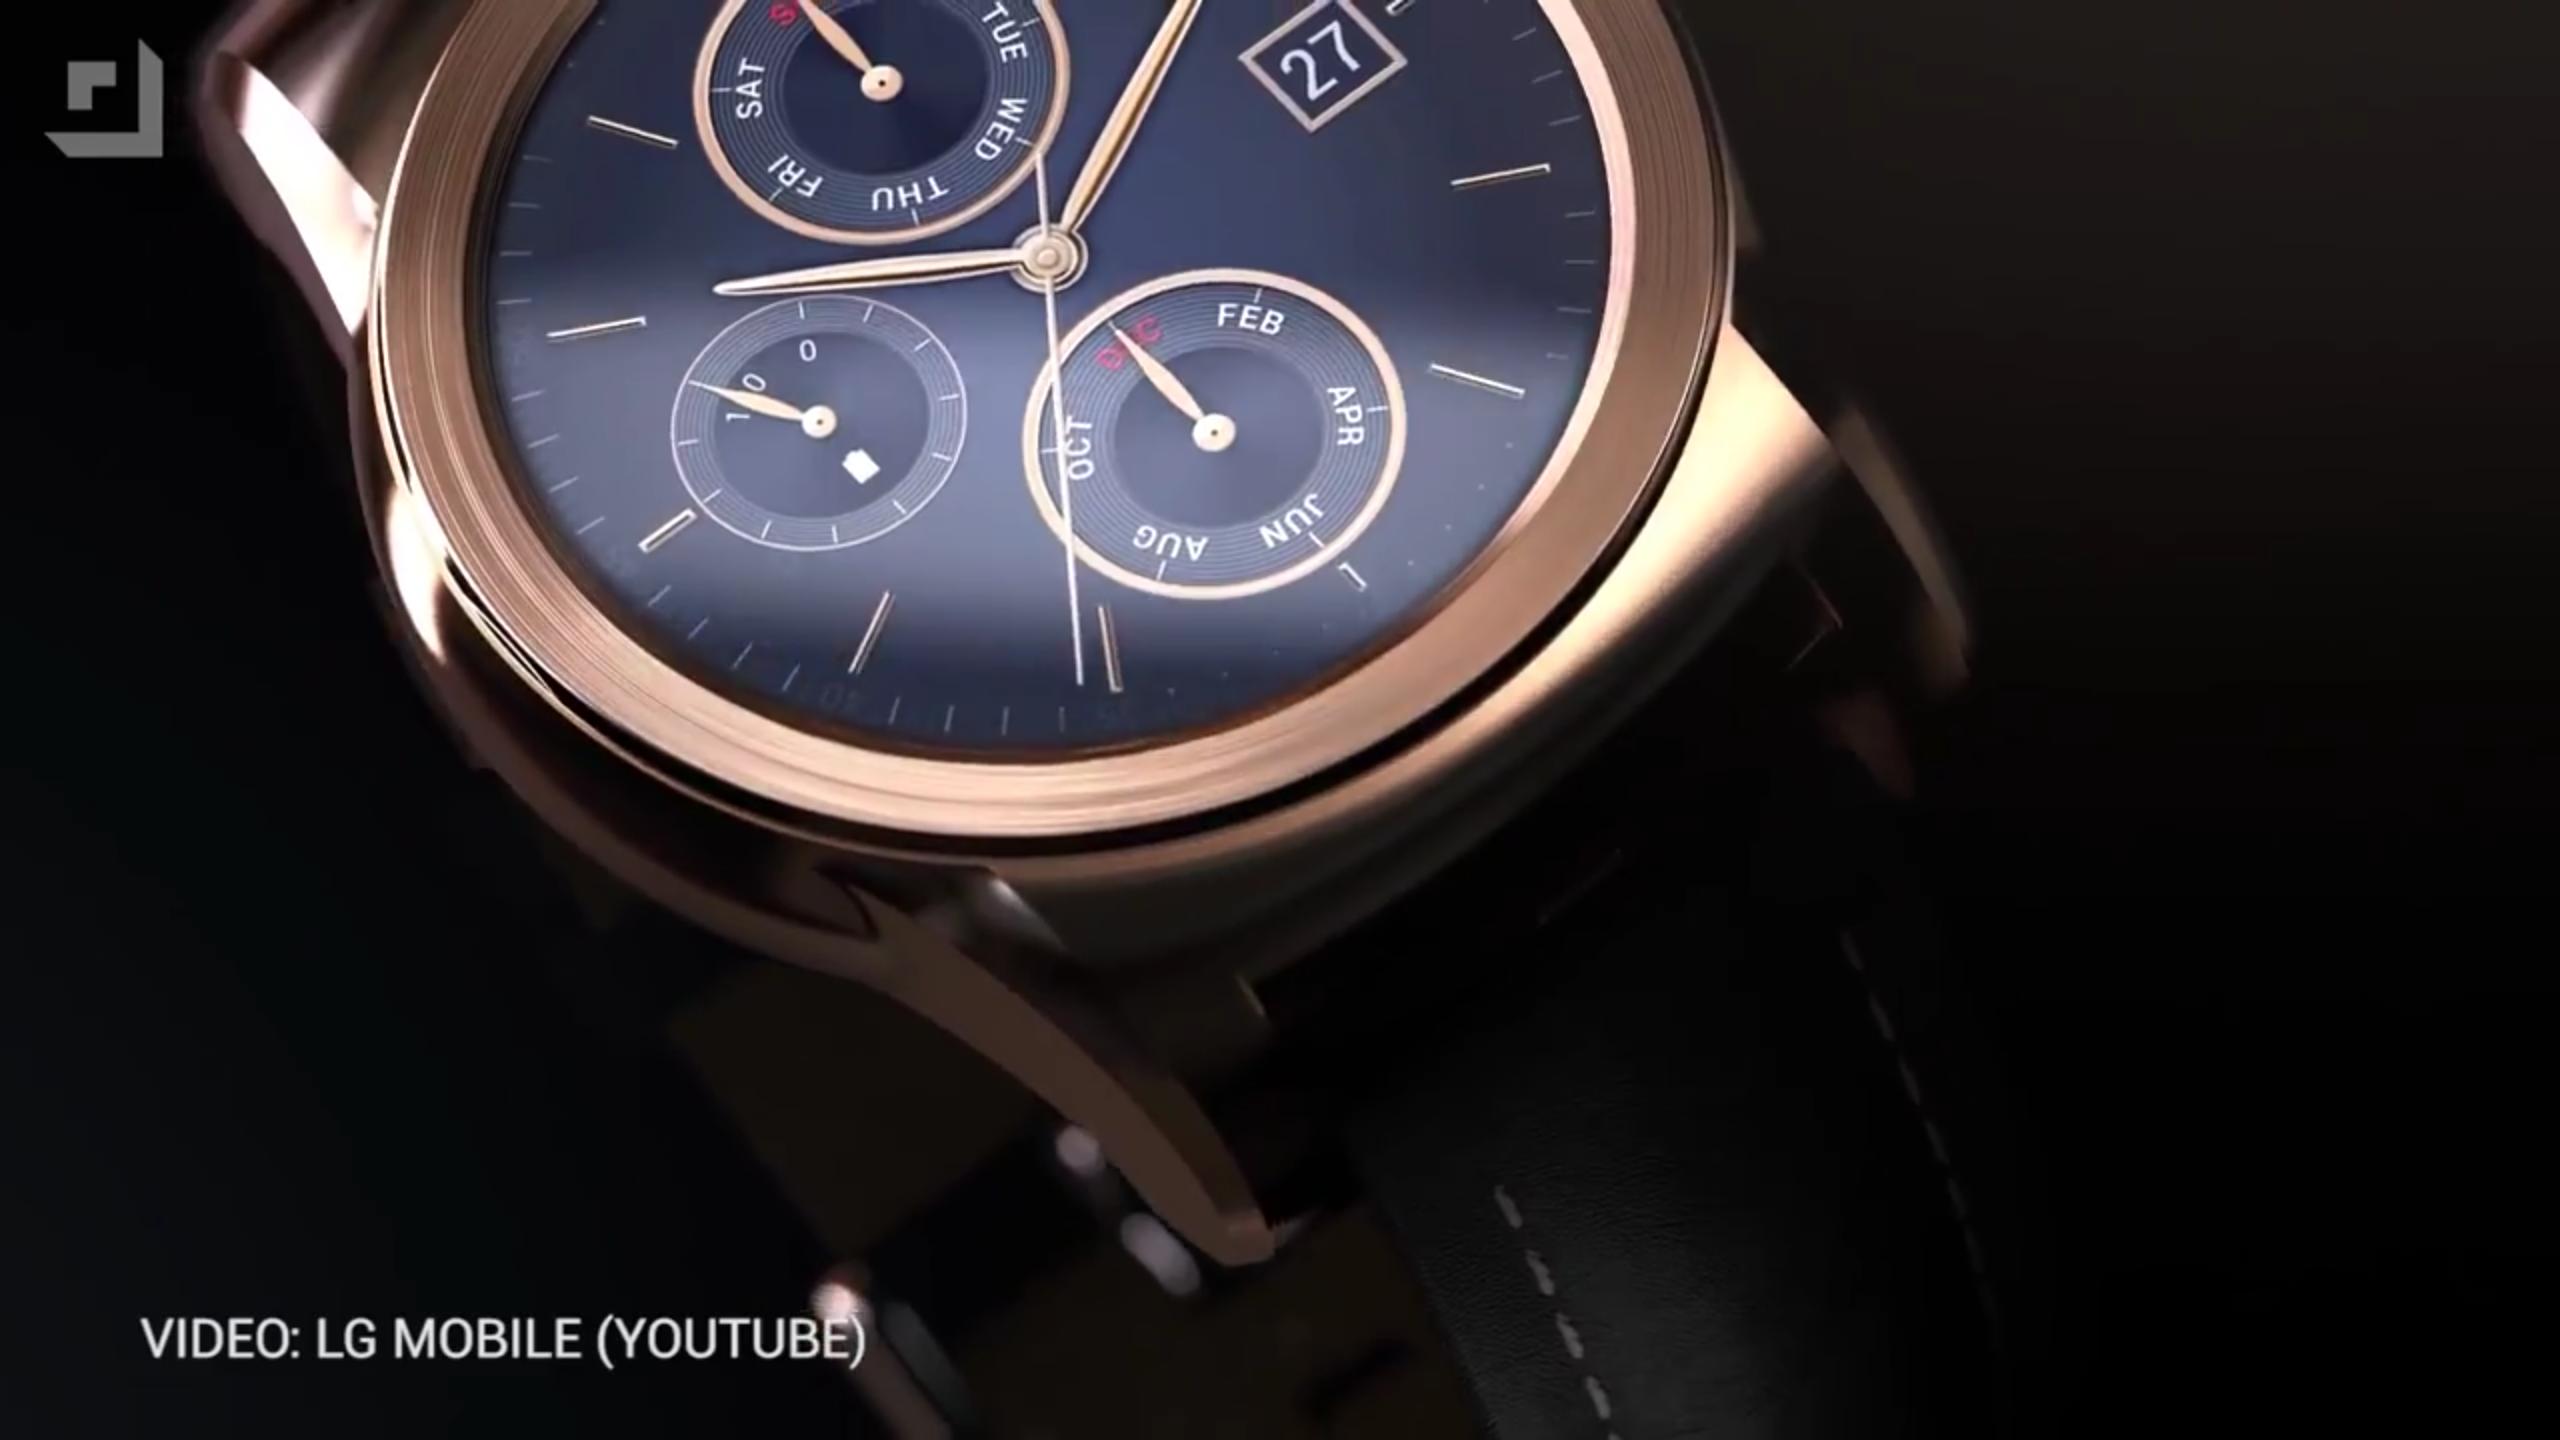 LG Watch Urbane LTE (2015) To Make A Return This Year ...